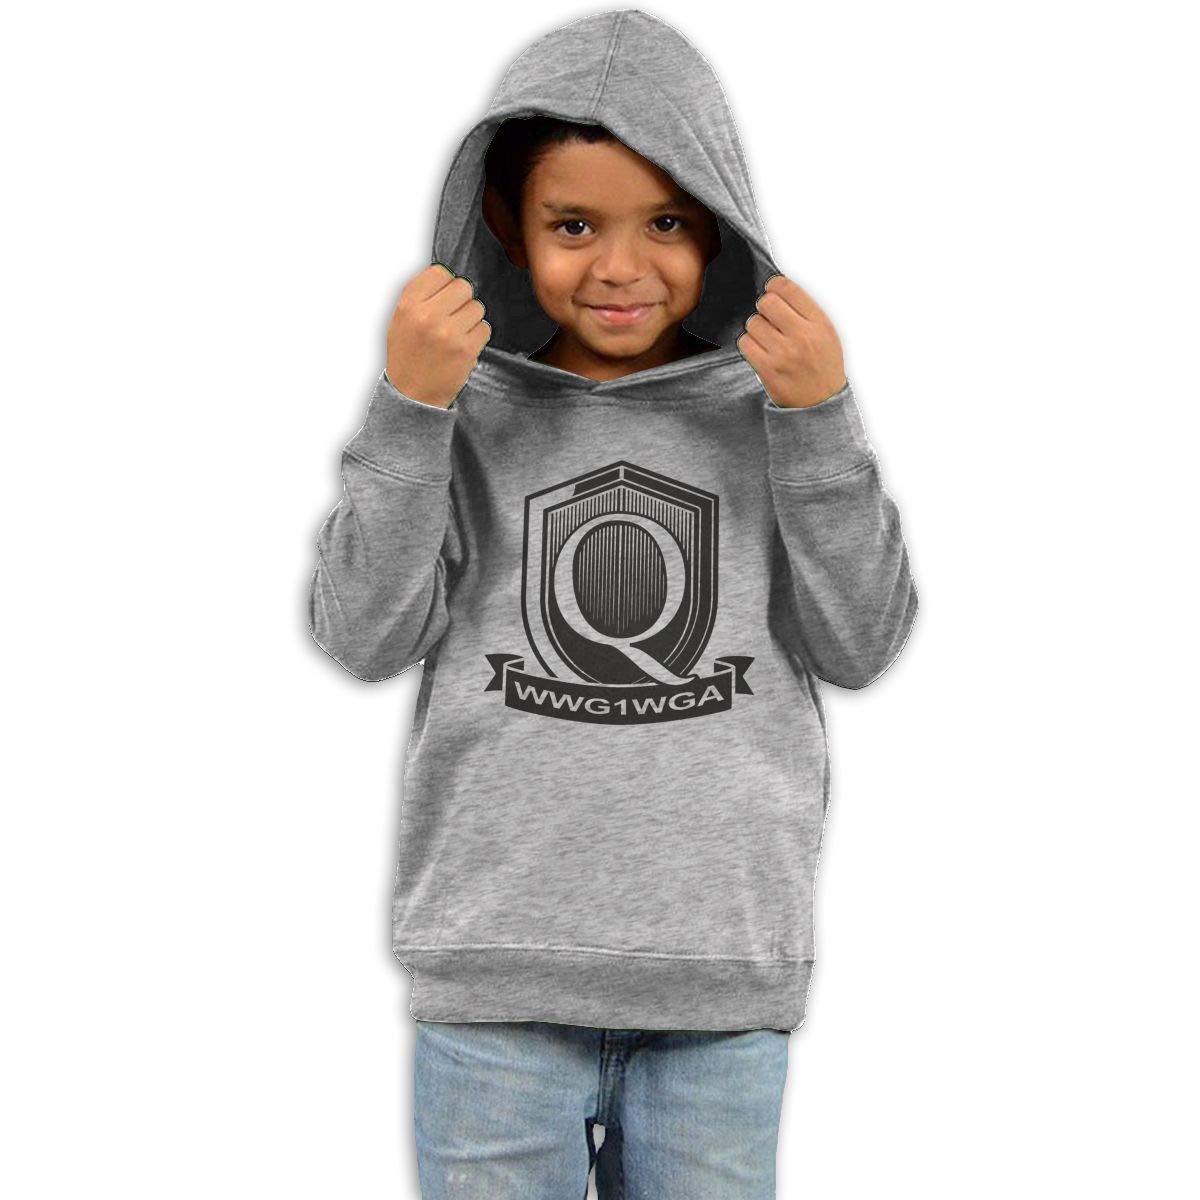 Stacy J. Payne Boys QAnon - Q Freedom Movement Funny Sweater39 Gray